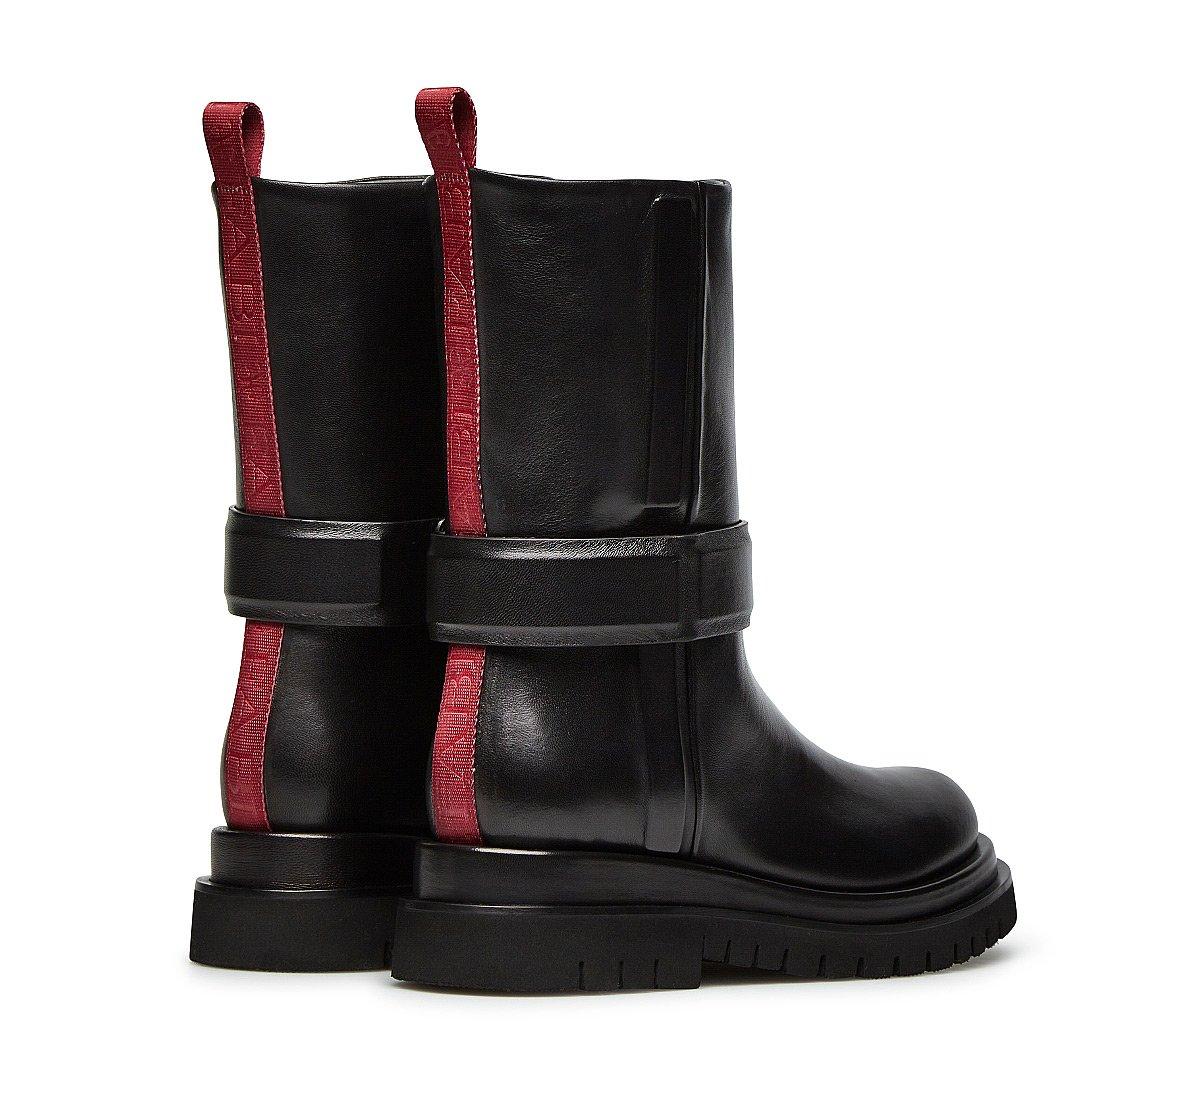 Soft nappa leather biker boots